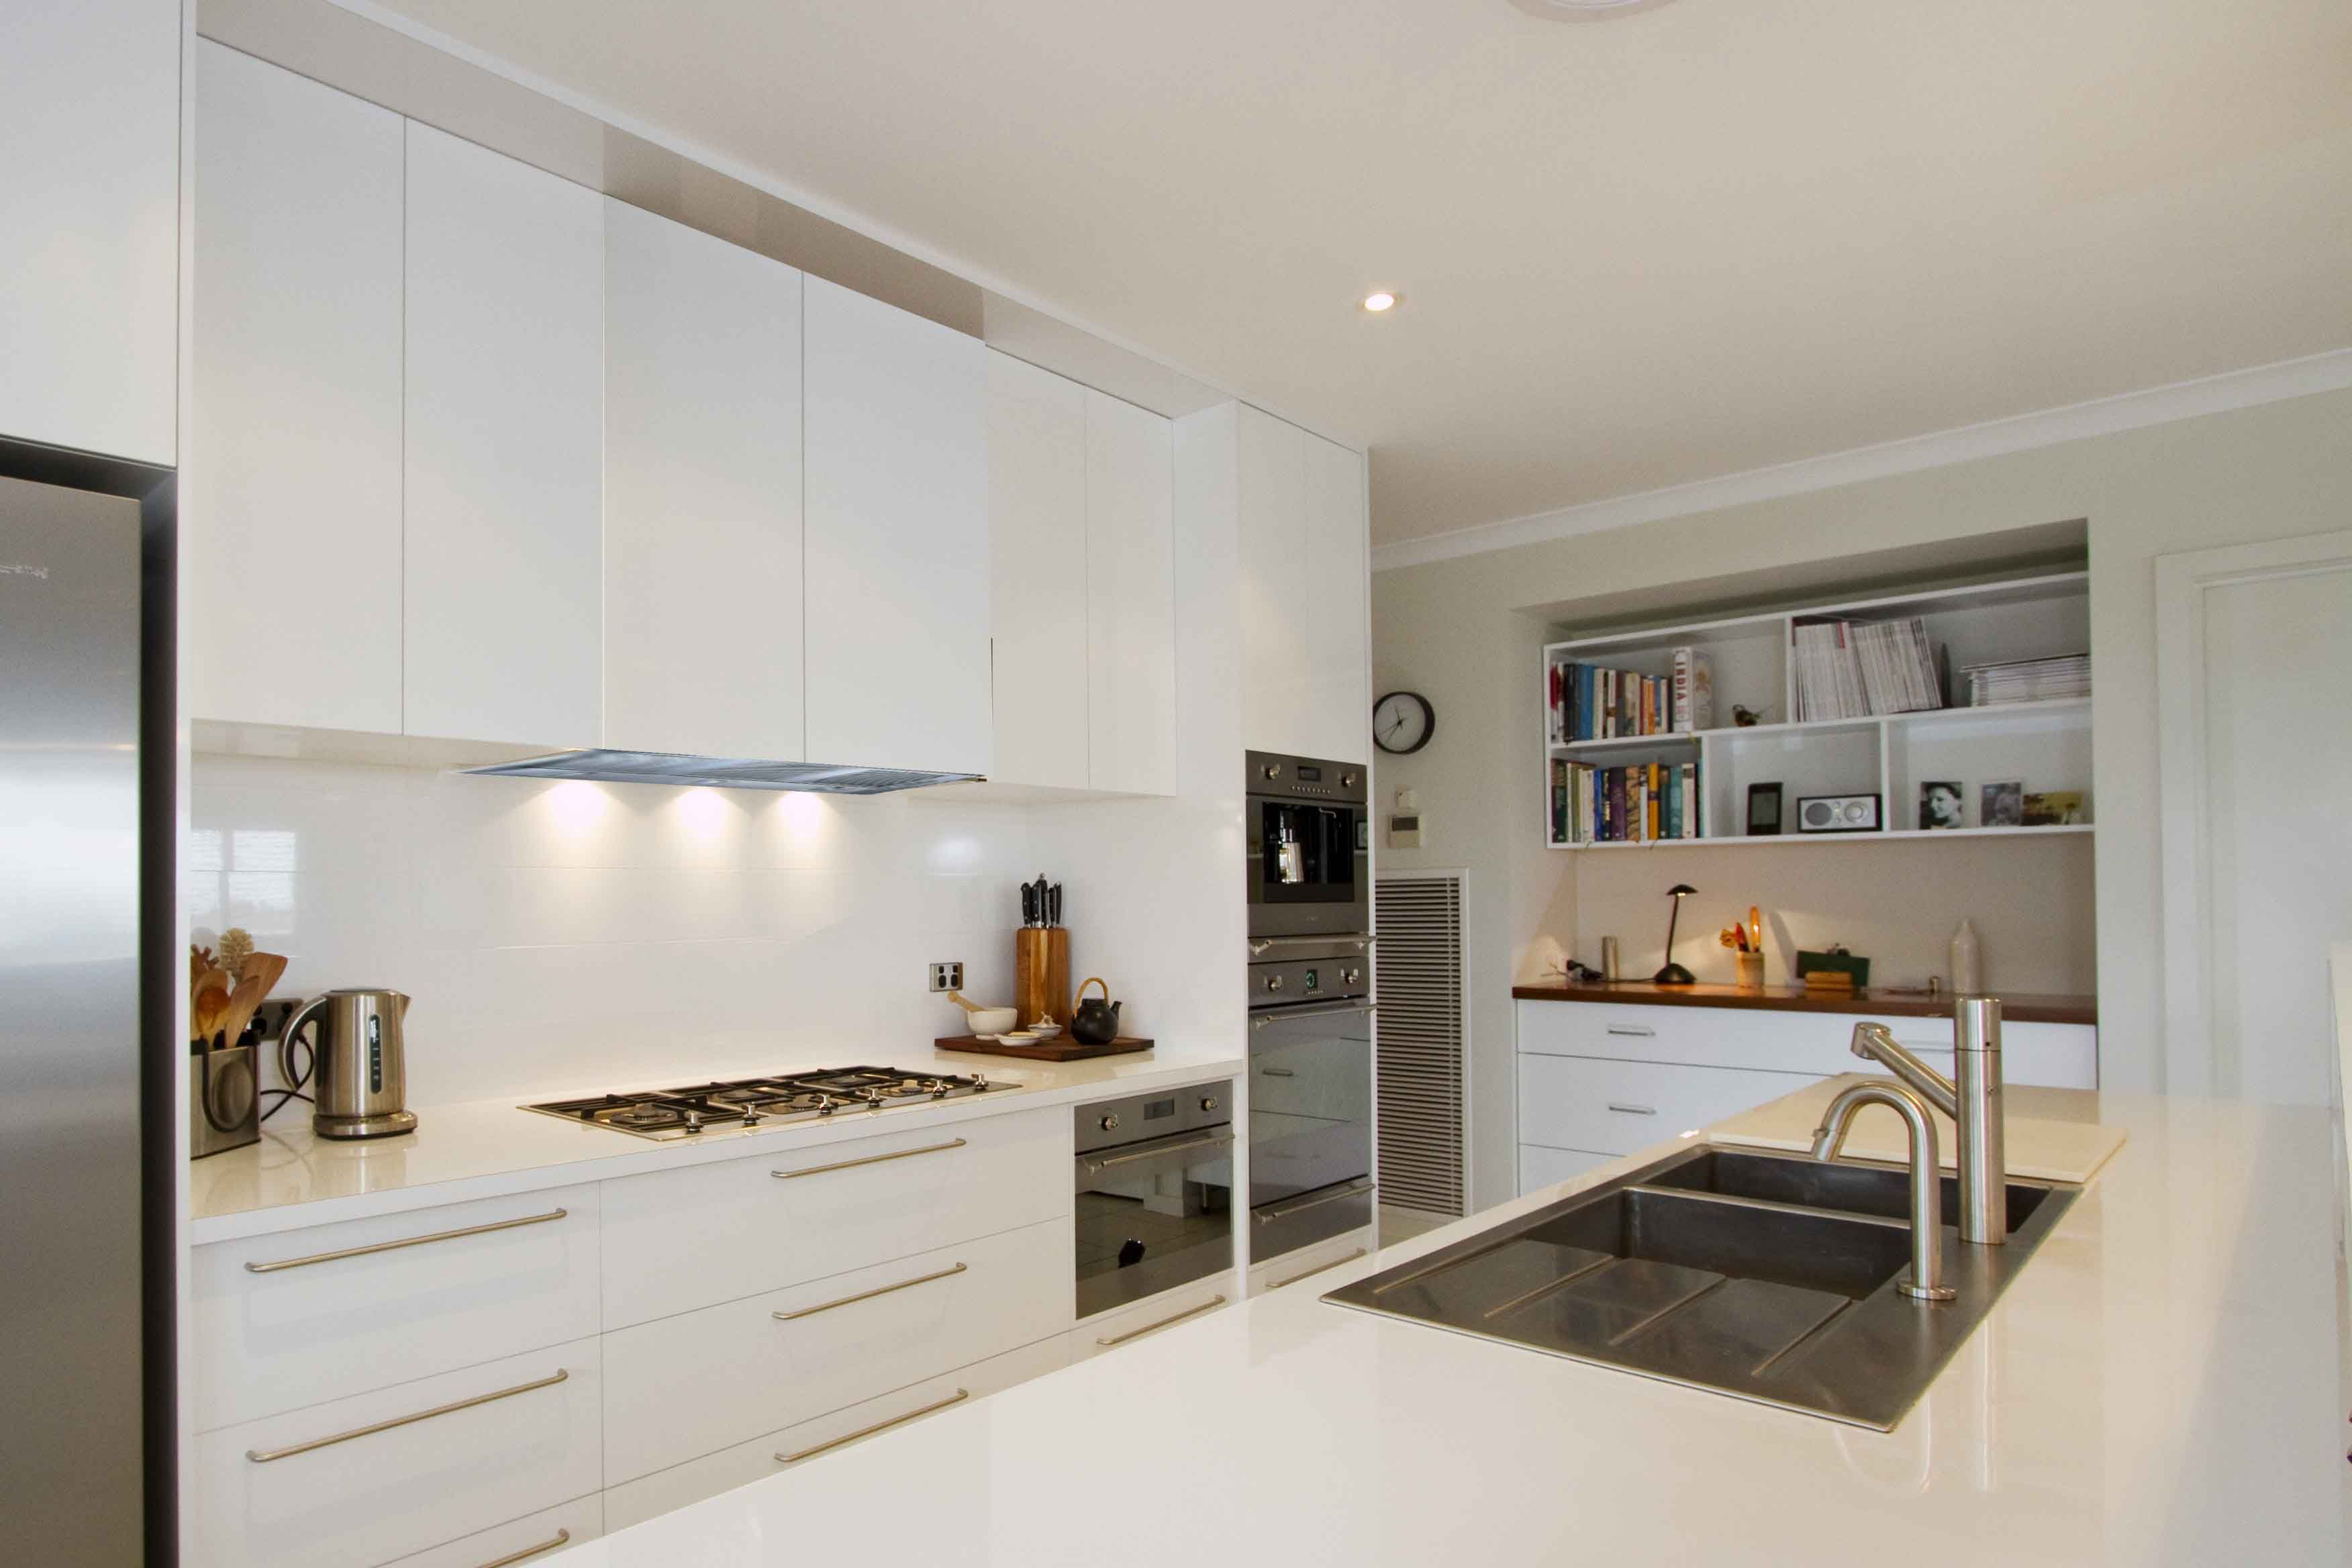 Undermount Rangehood Google Search Kitchen In 2019